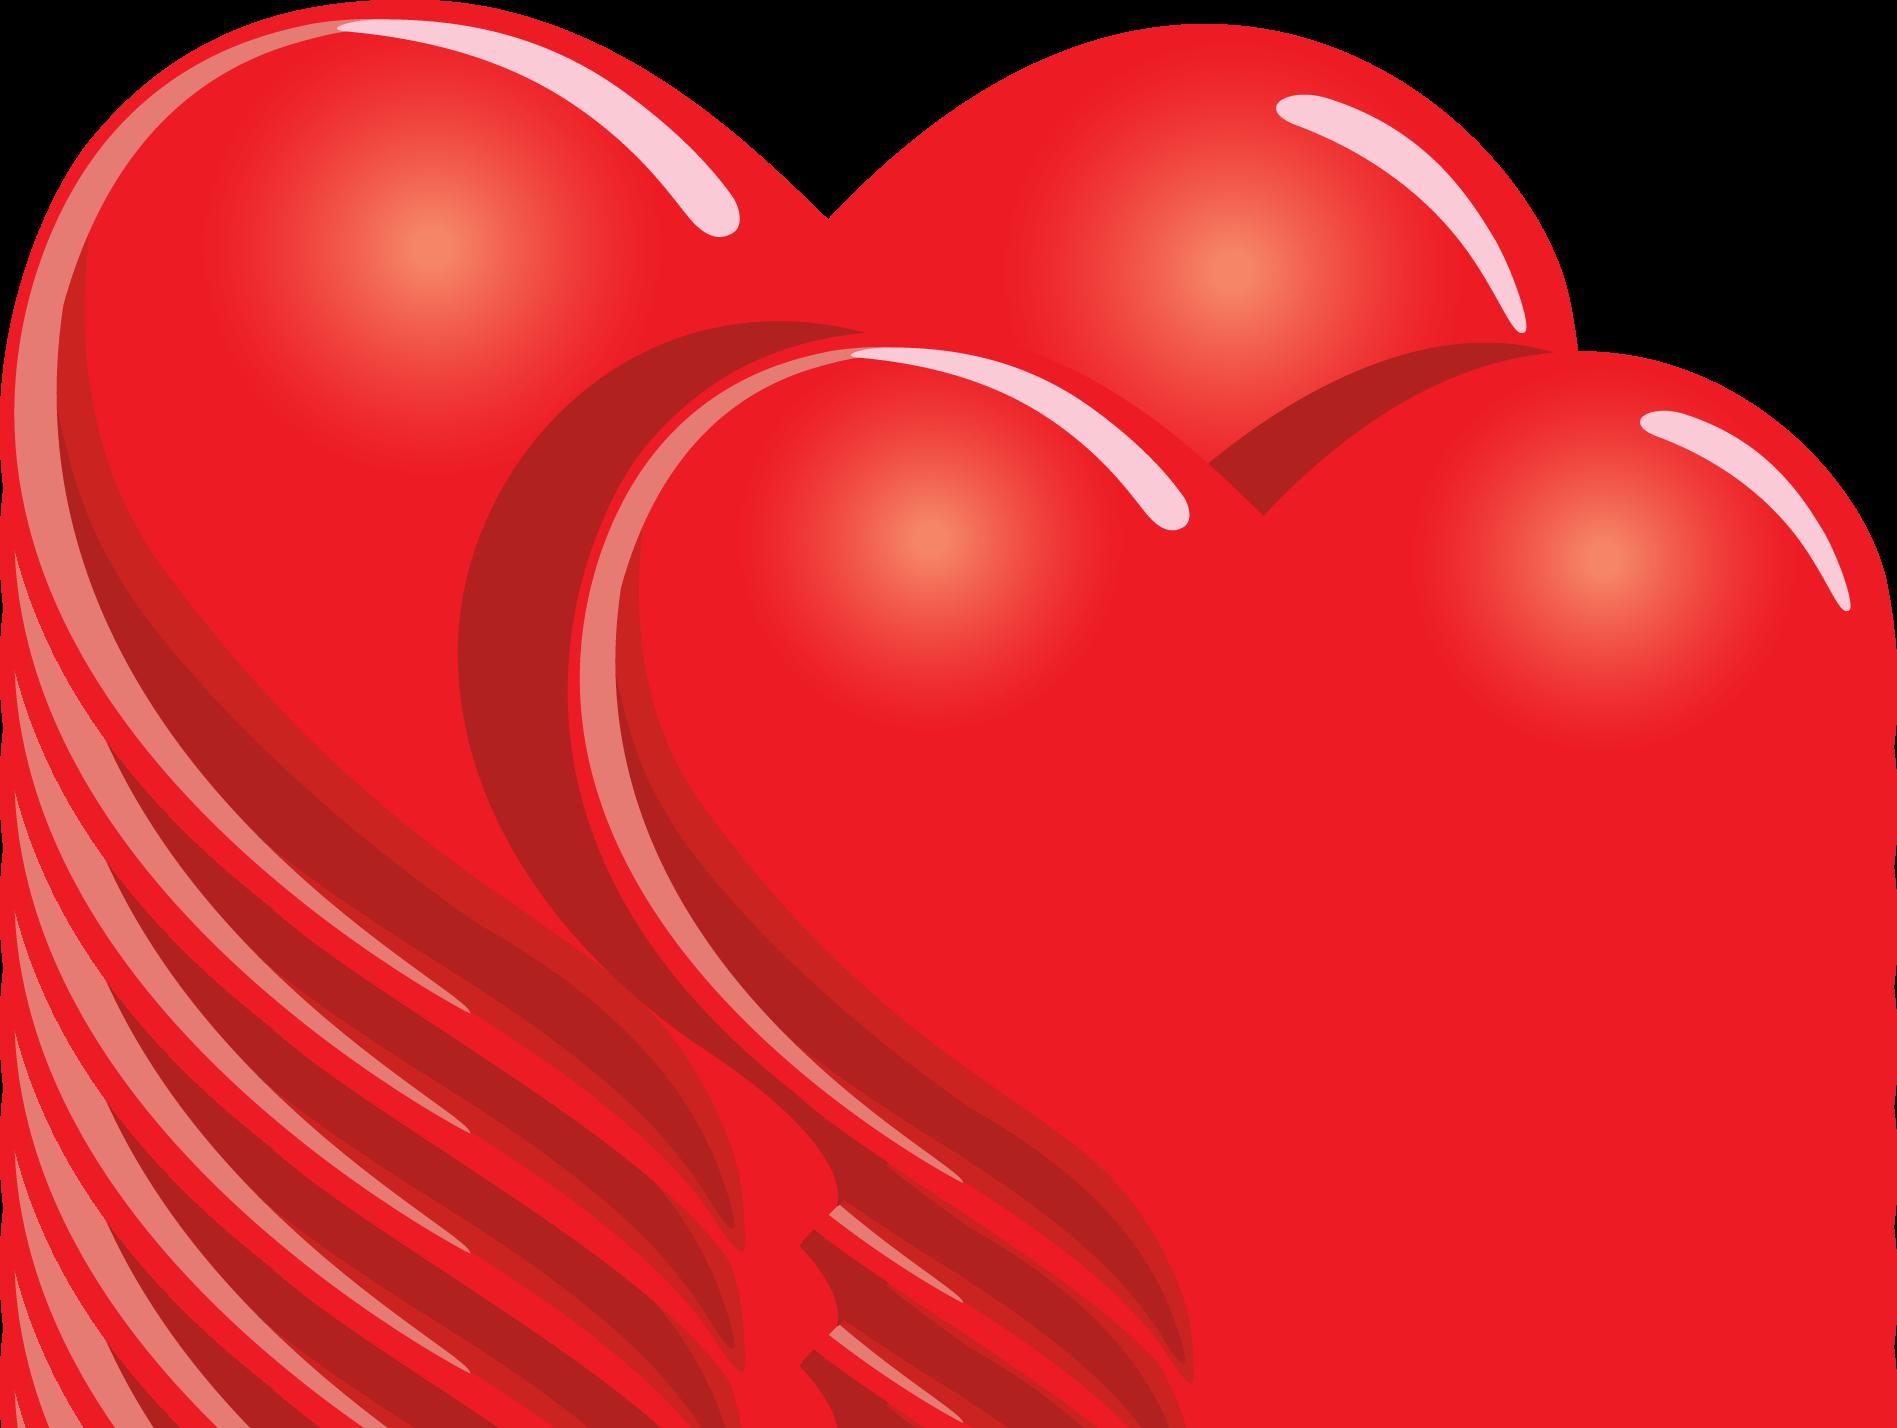 Raindrop clipart red.  heart symbol free